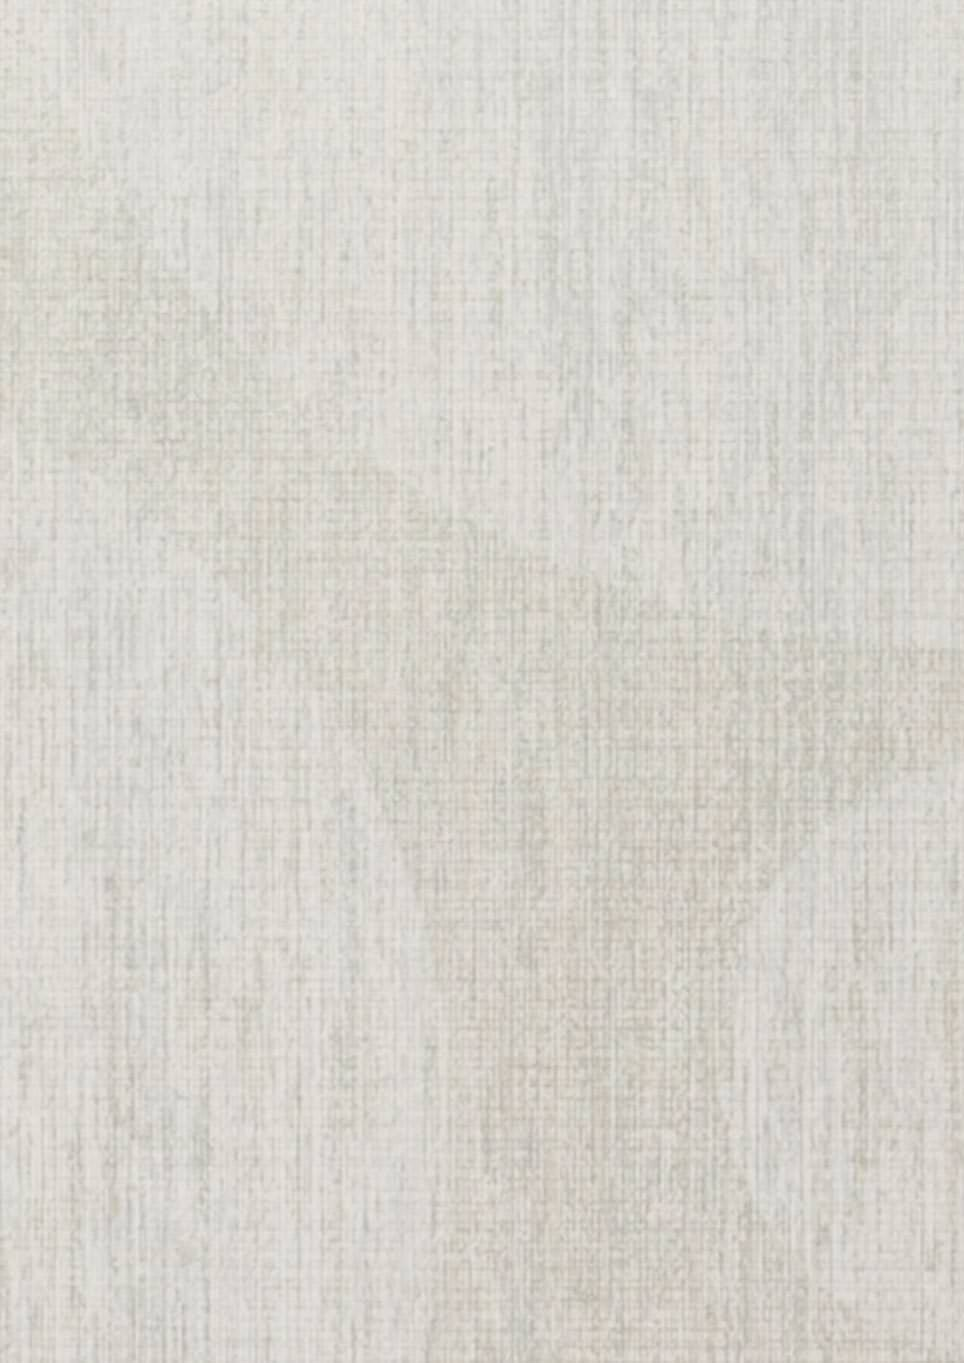 Papel pintado sabulana marfil claro plata blanco for Papel pintado color plata